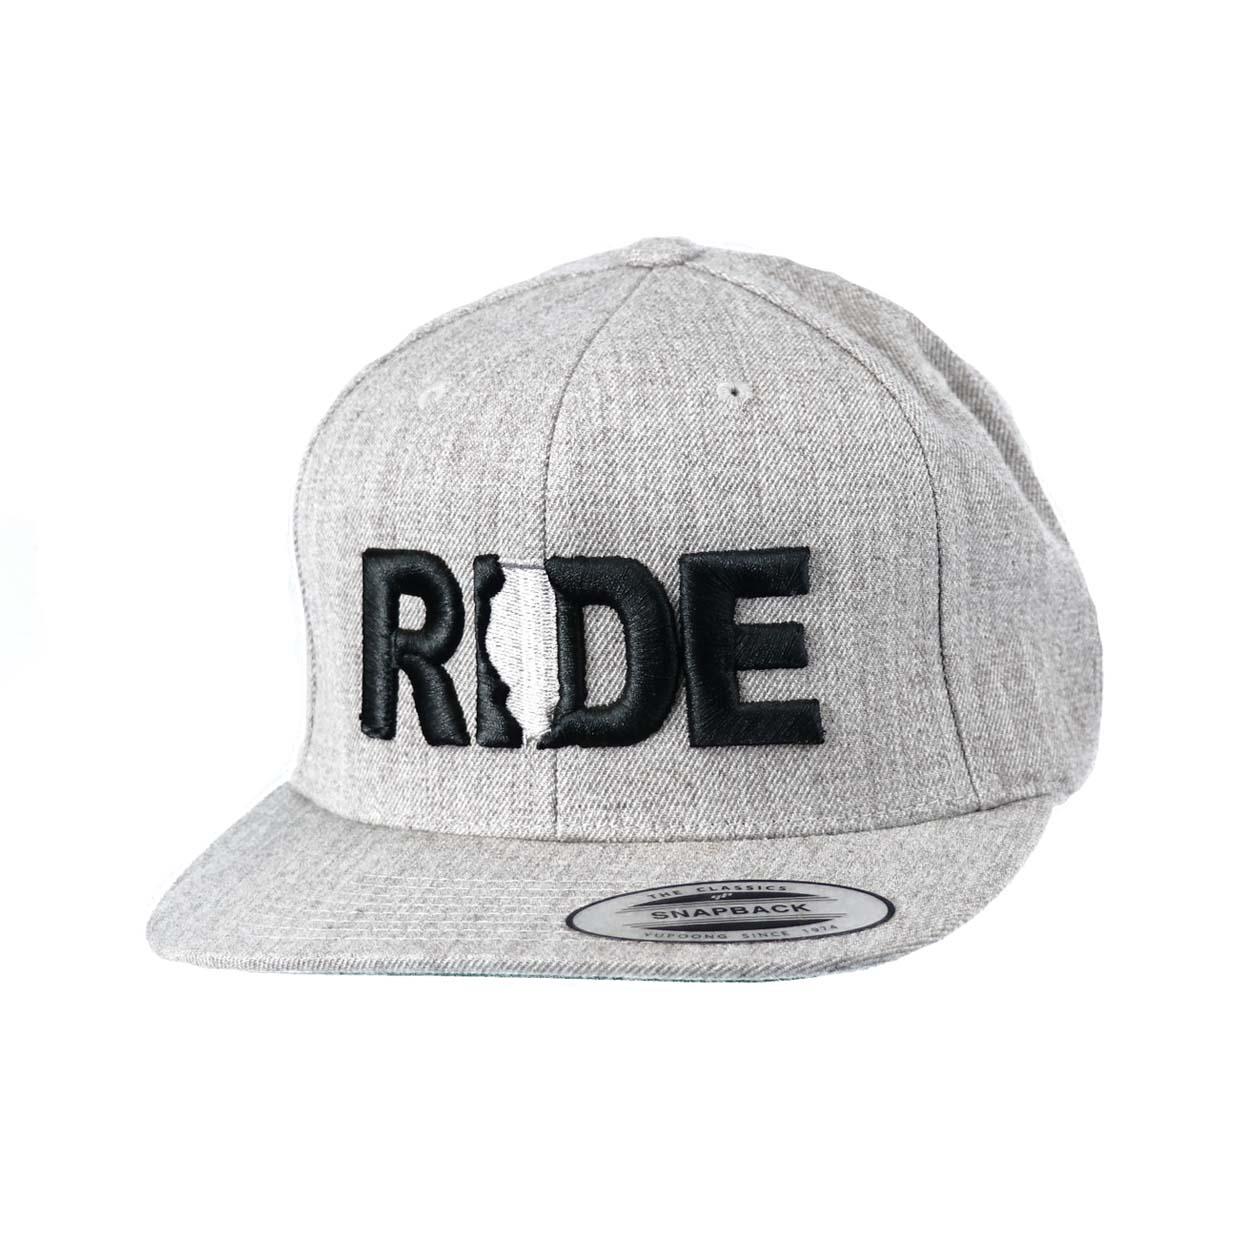 Ride Illinois Classic Embroidered  Snapback Flat Brim Hat Gray/Black